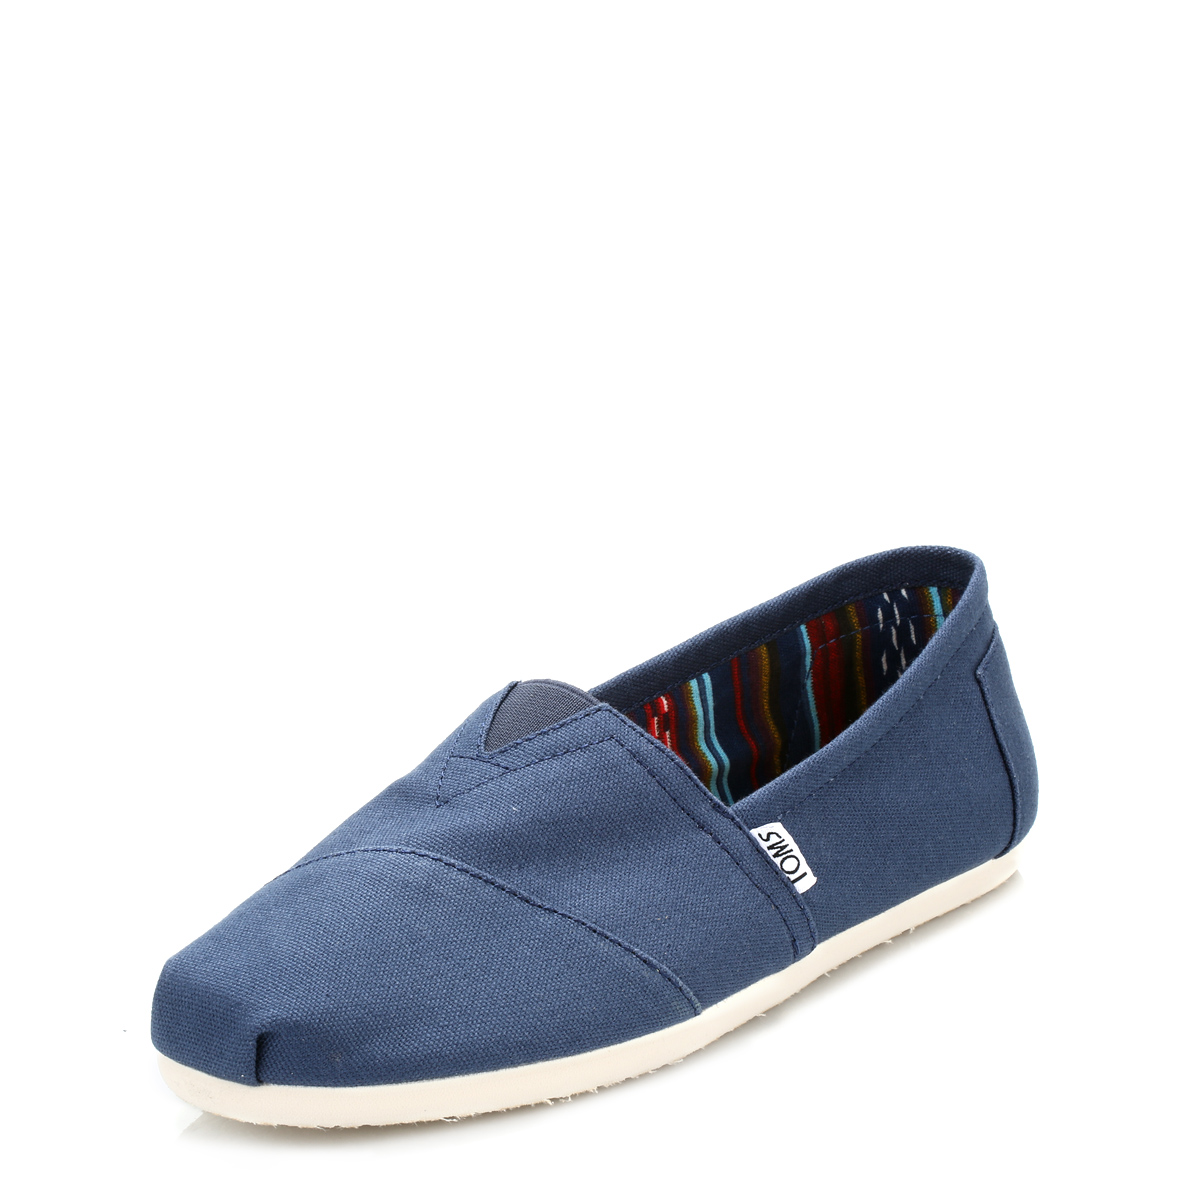 74449a00023 Details about TOMS Classic Mens Espadrilles Navy Blue Canvas Slip On Flats  Casual Shoes